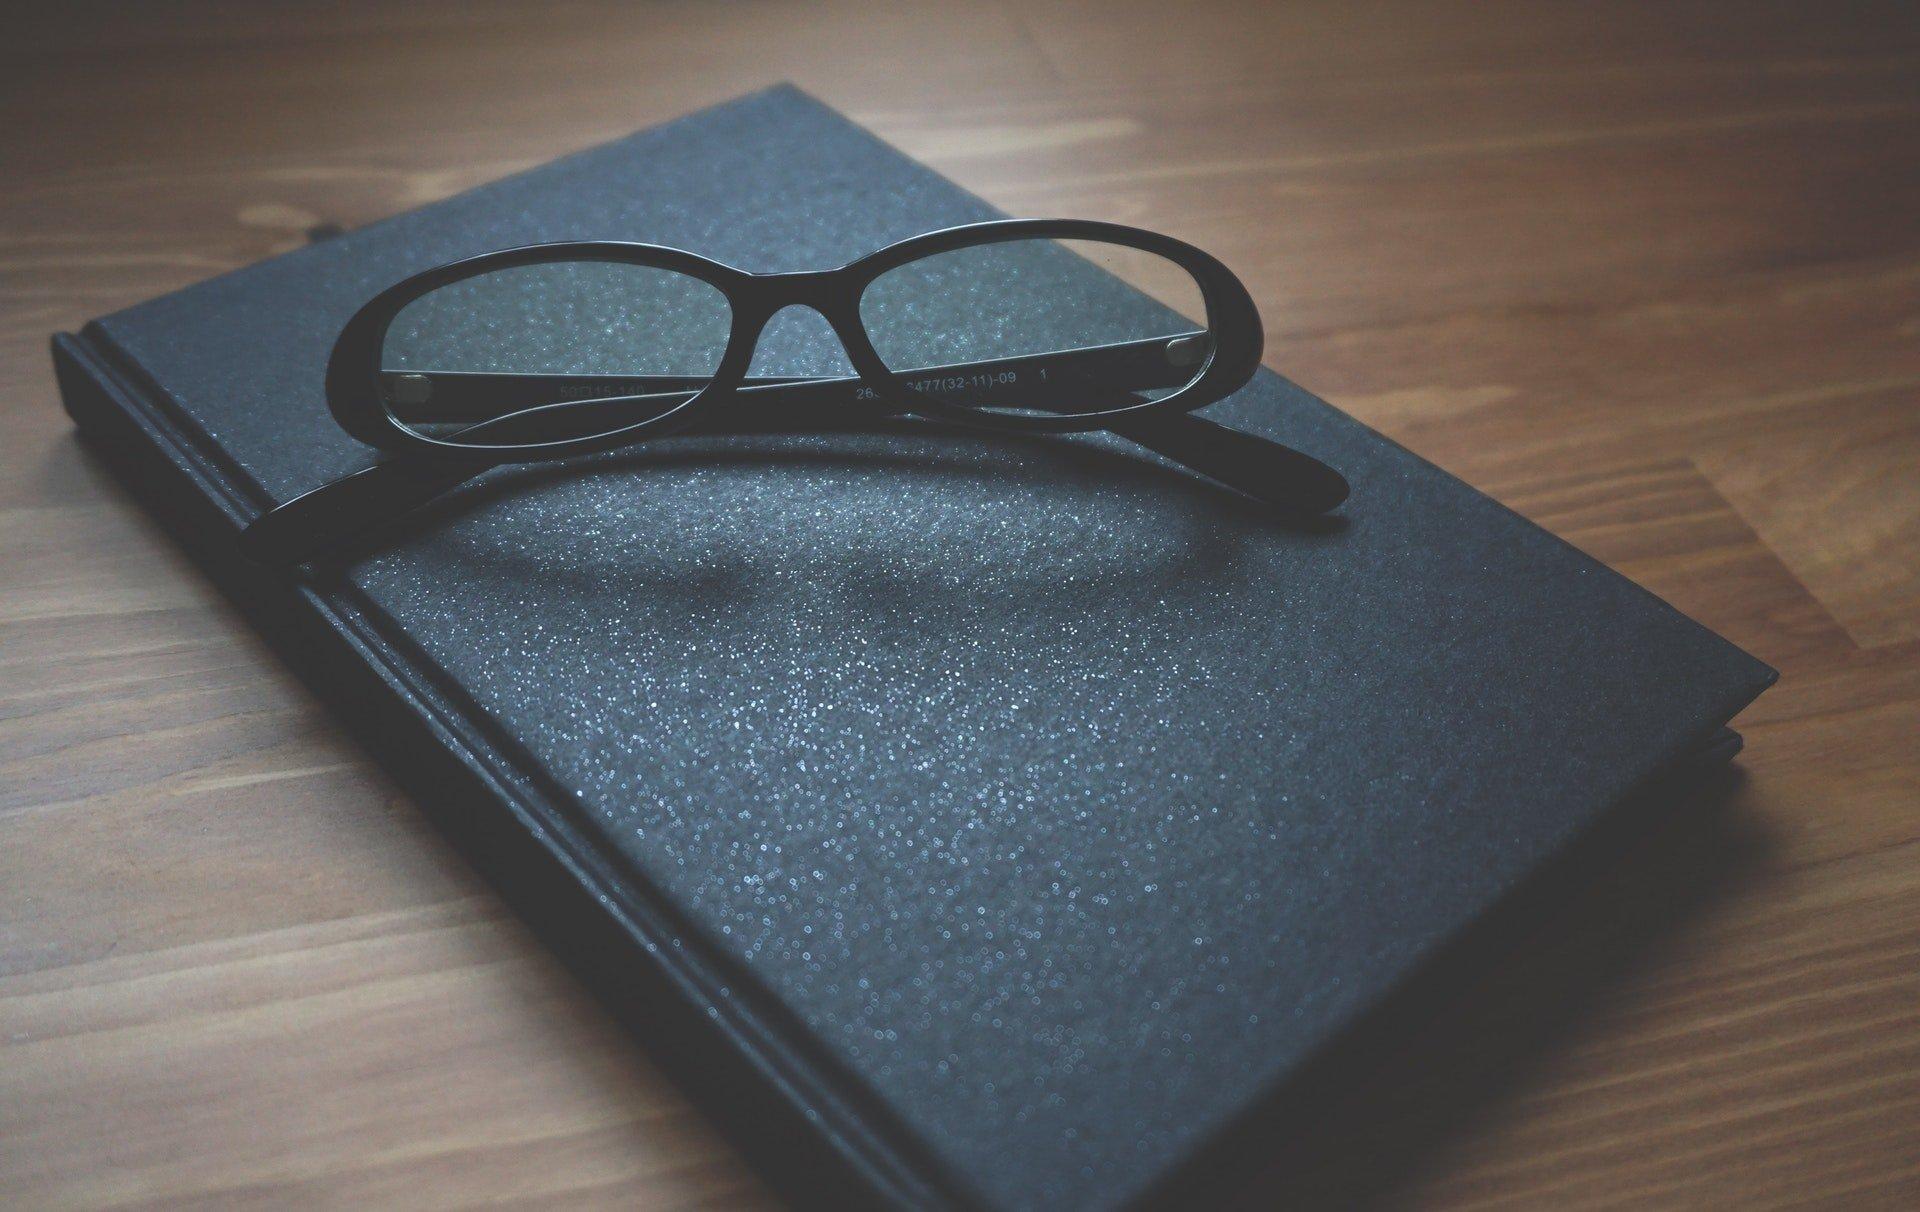 blur-close-up-eyeglasses-163142